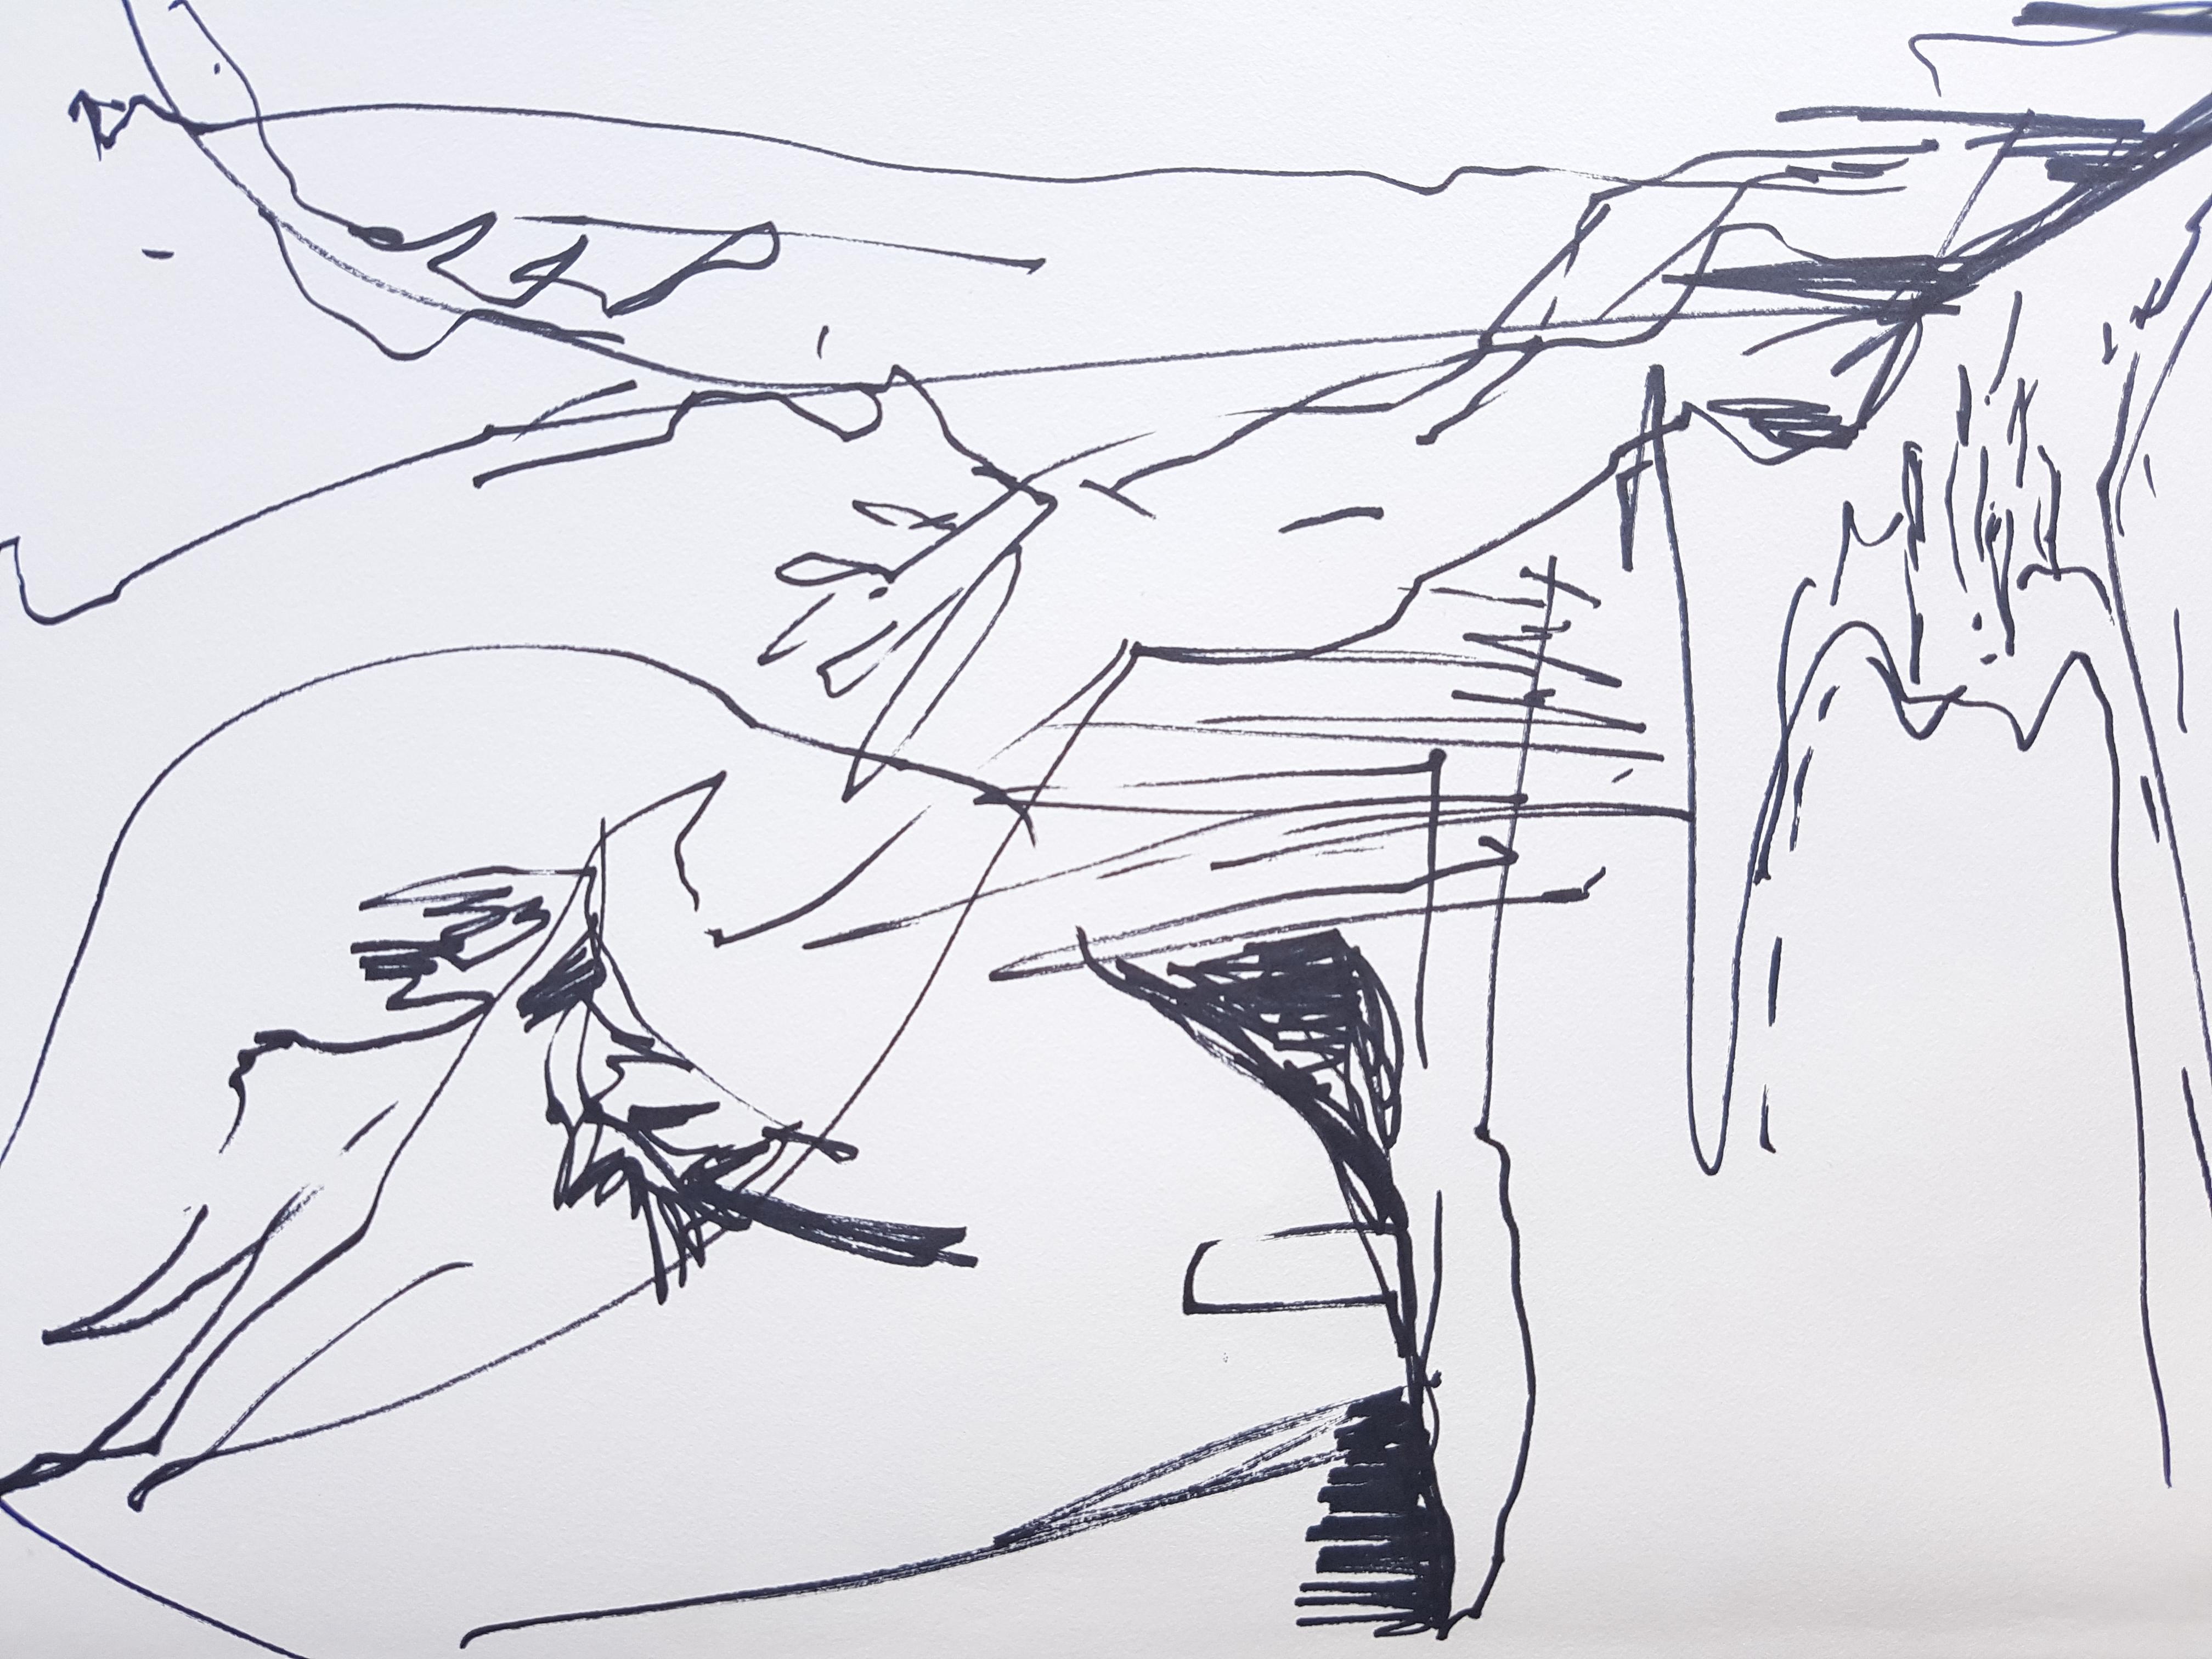 'Drawing holywells'